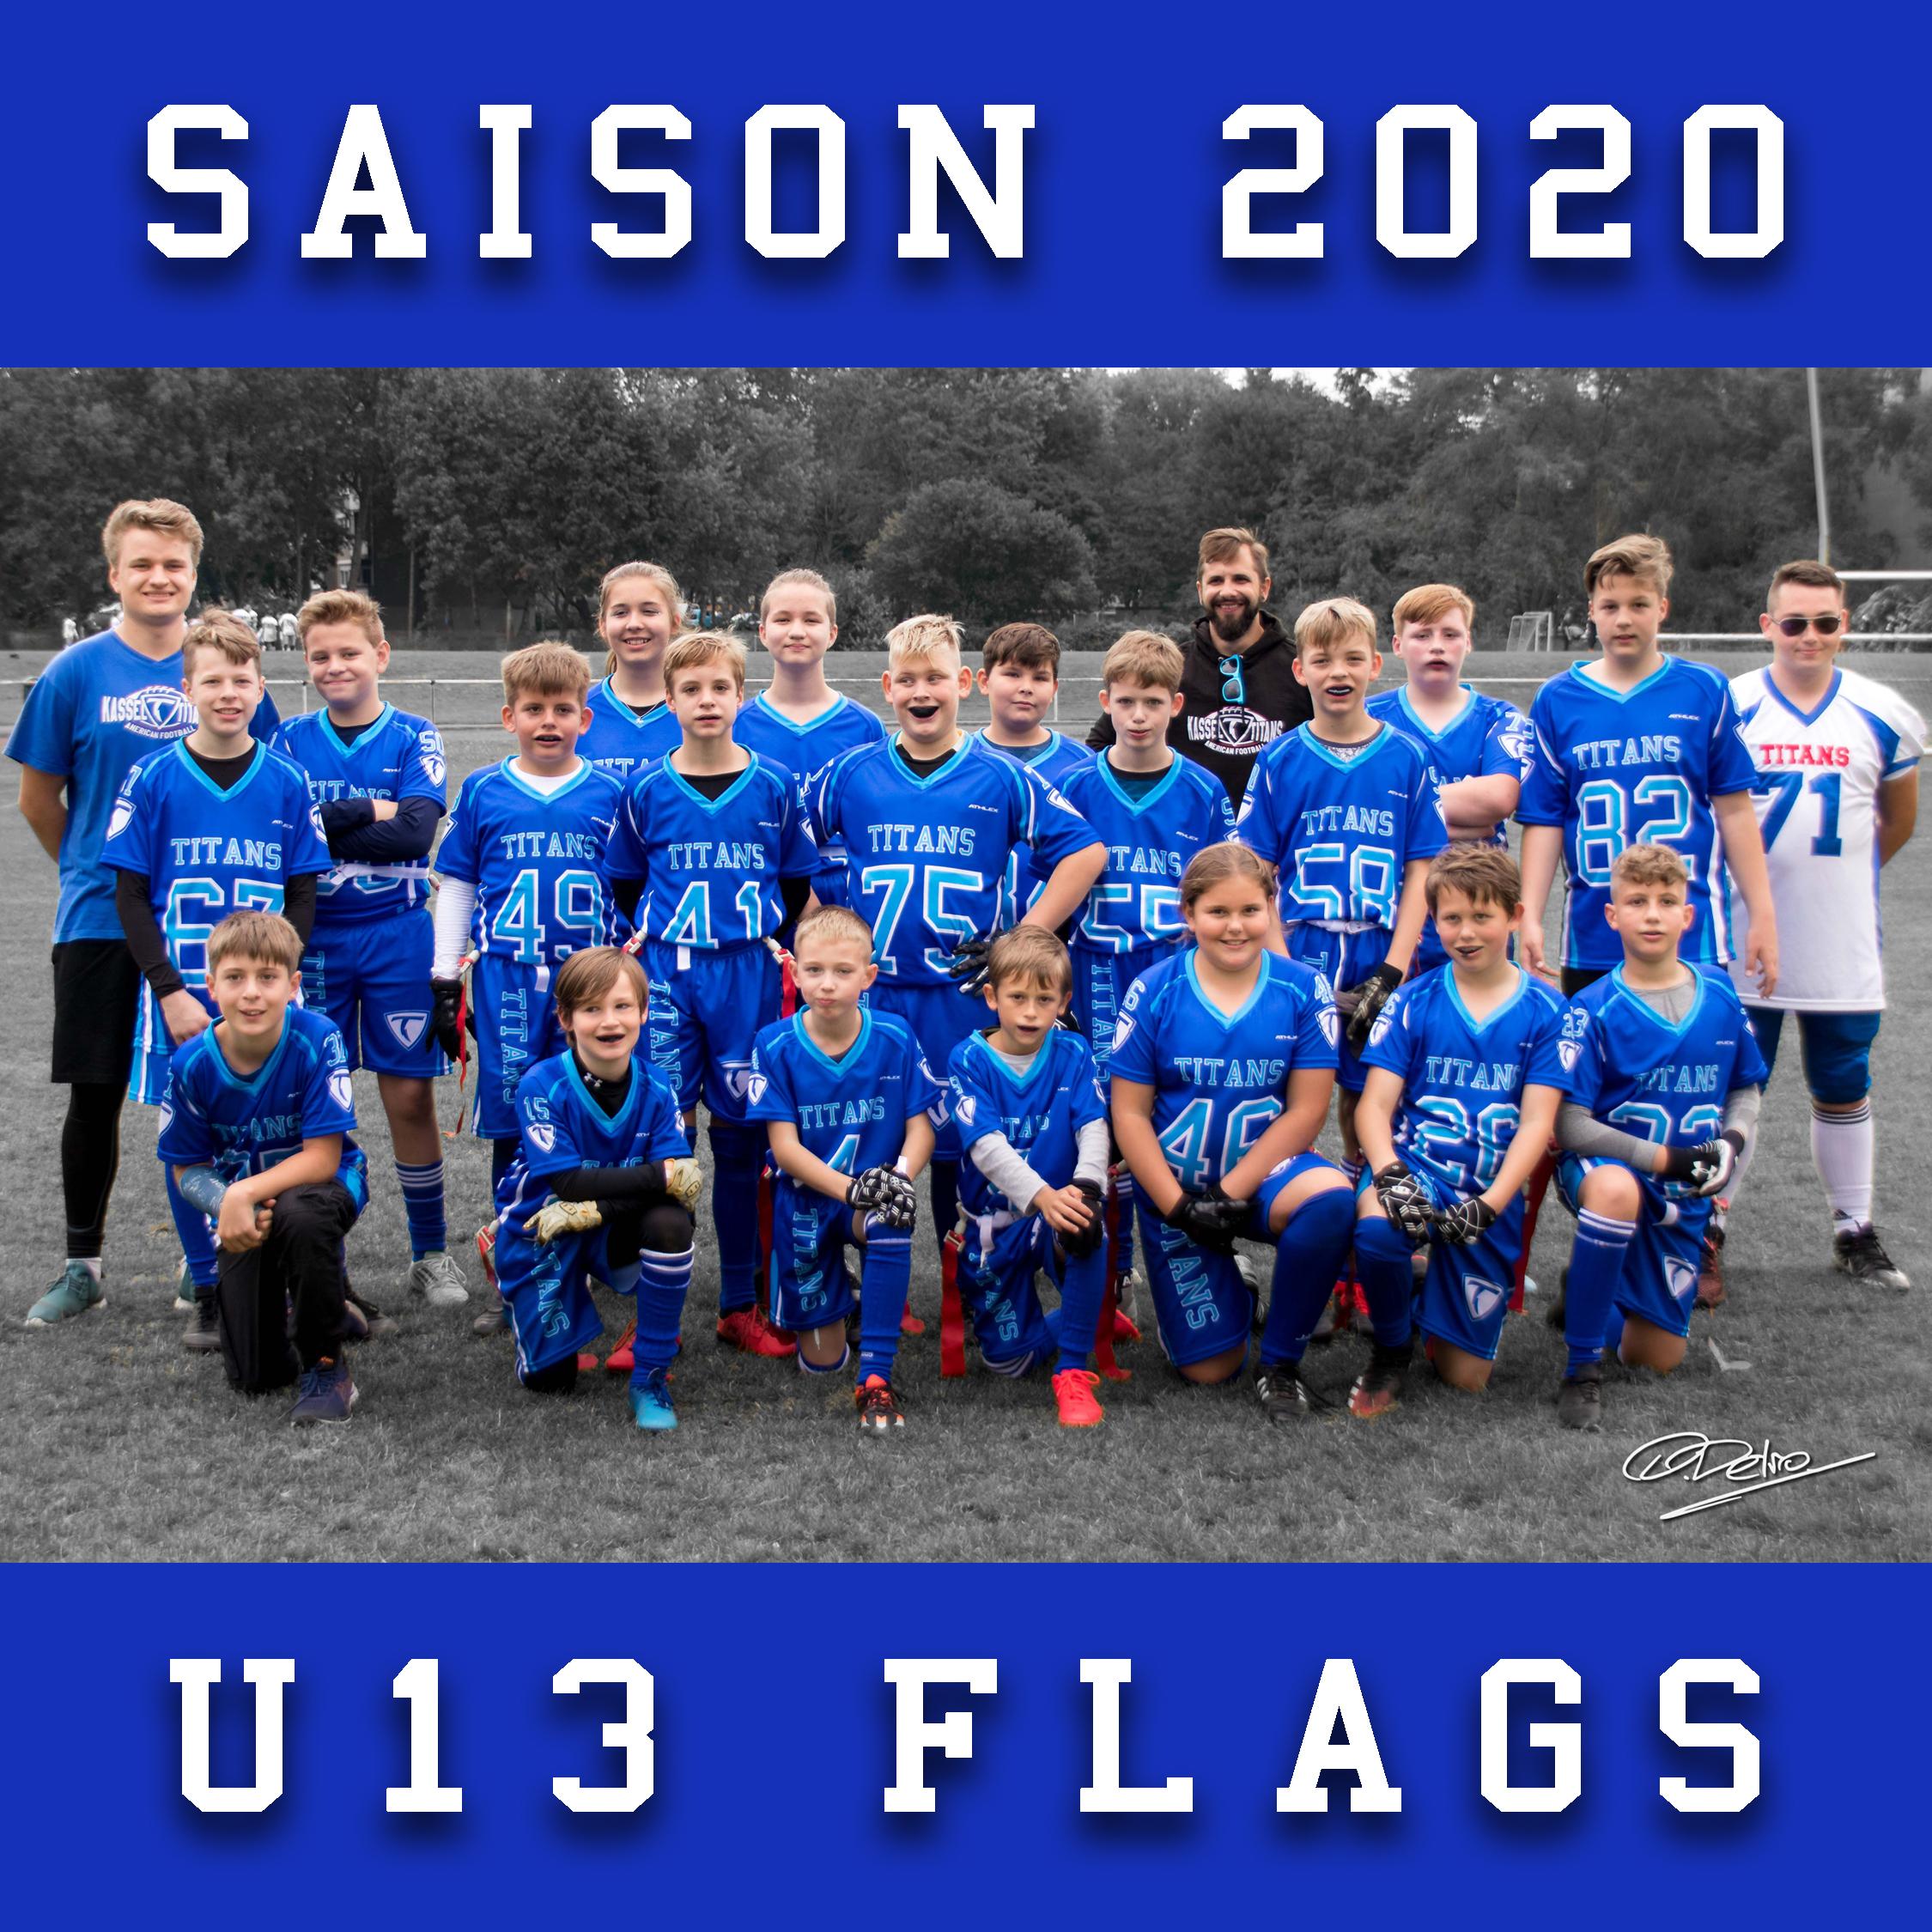 U13 Saisonbericht 2020